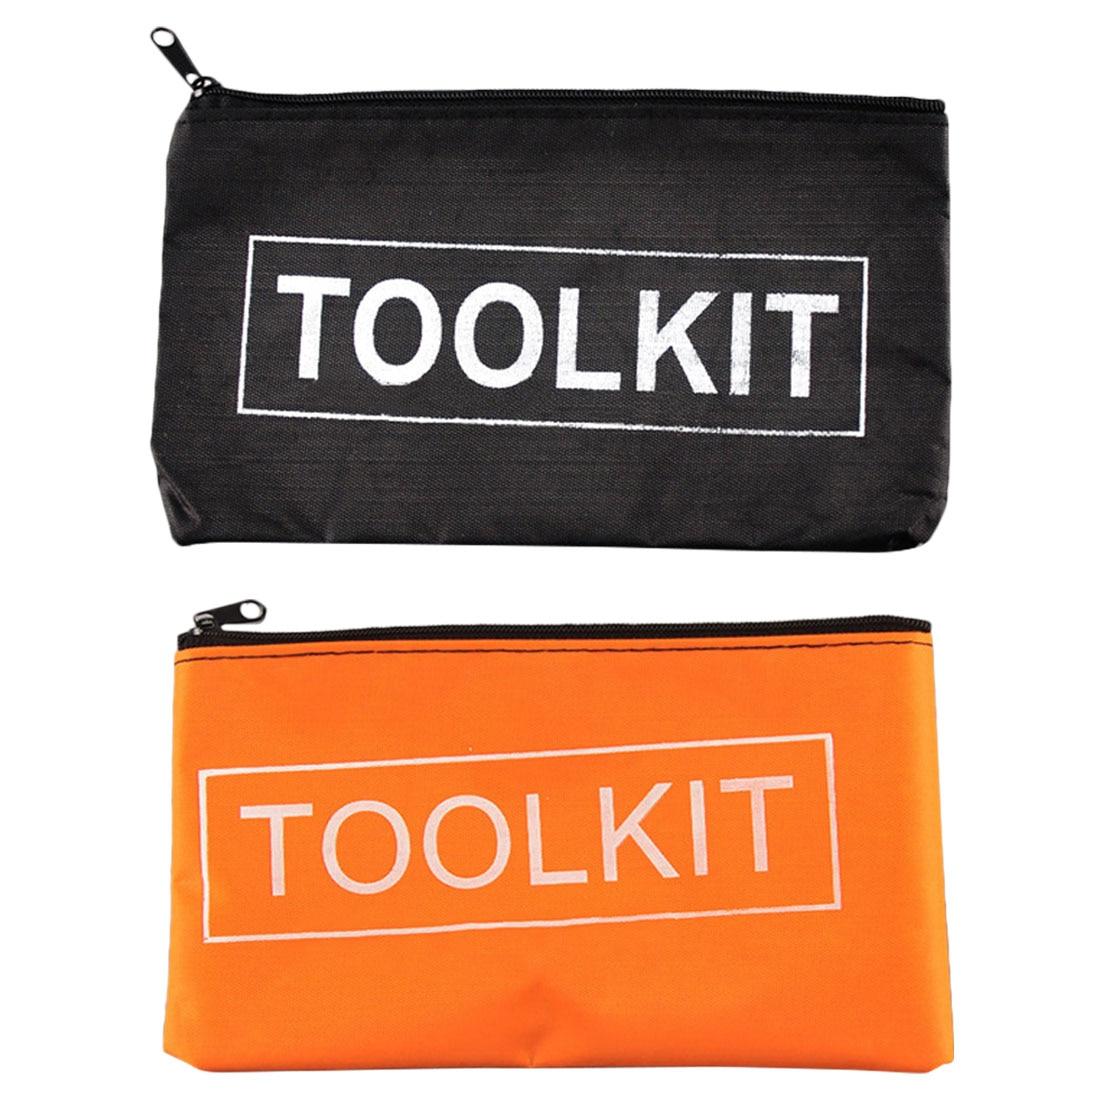 Portable Mini Tool Kit Bag 600D Oxford Cloth Tool Bag Storage Instrument Case 19x11cm Universal Size Hand Tool Bag Pocket